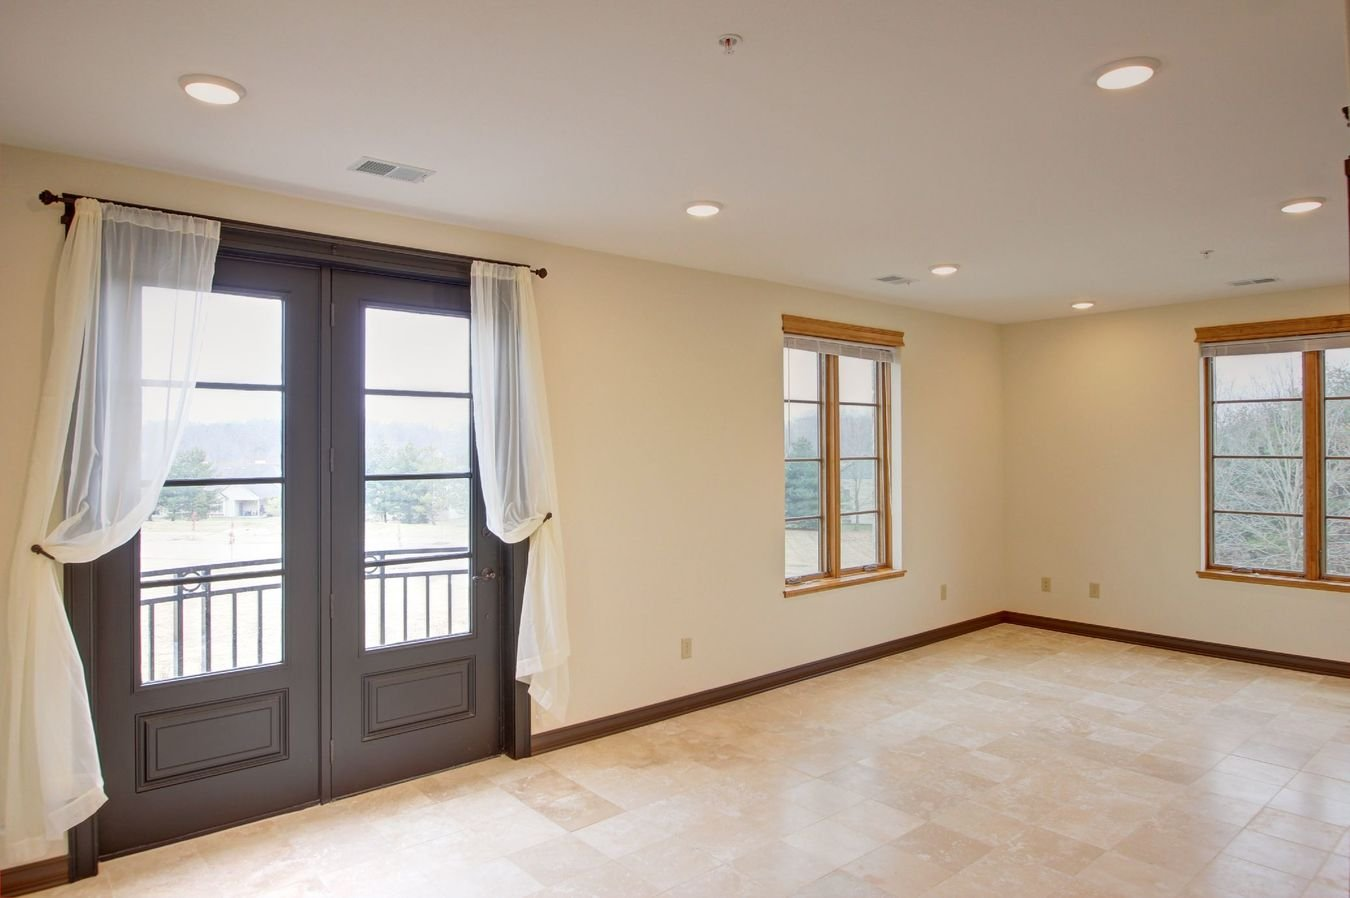 1 Bedroom 1 Bathroom Apartment for rent at Verona Park in Bloomington, IN